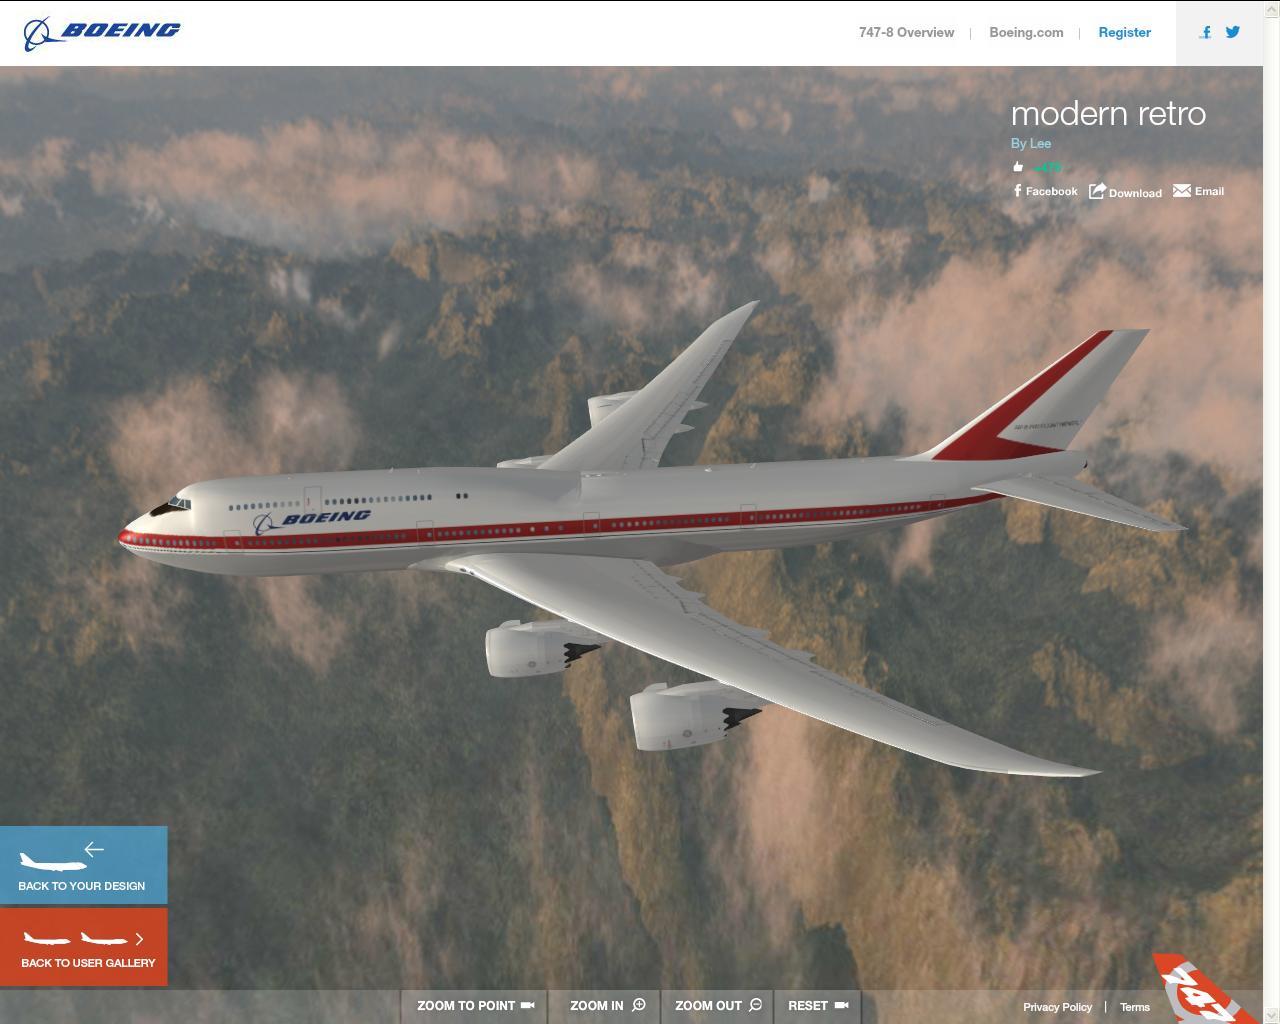 Design Your Own Boeing 747 8 Livery Online Diecast